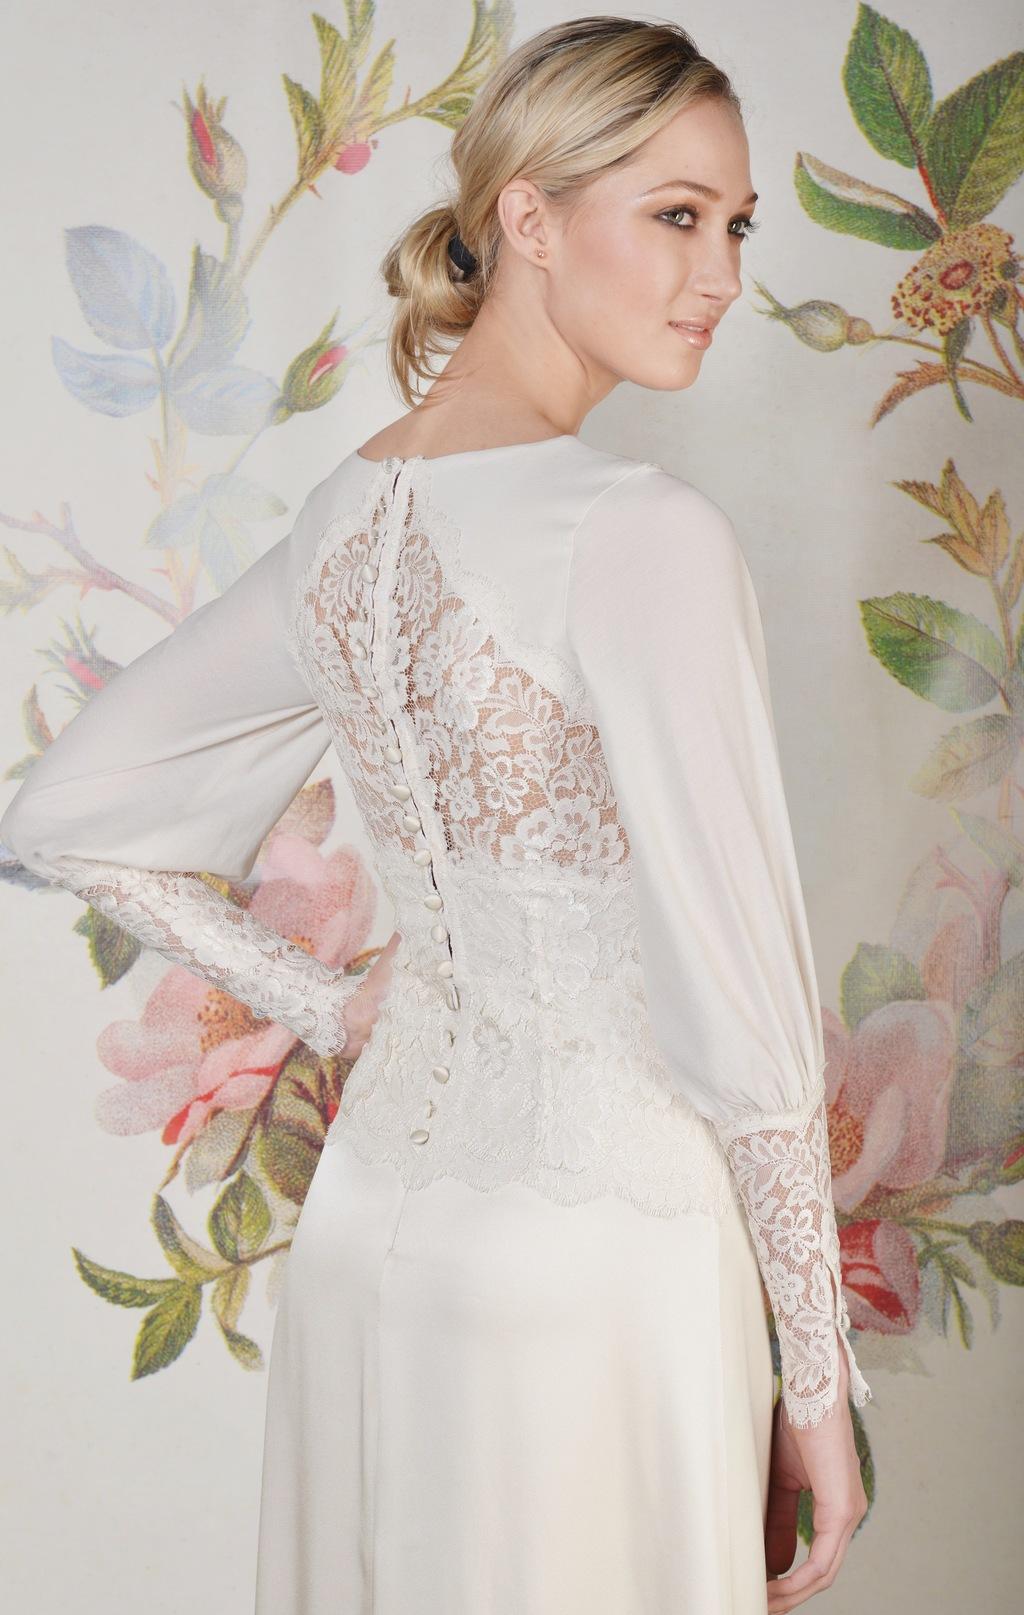 Claire-pettibone-spring-summer-2014-wedding-dress-estelle_b_03.full